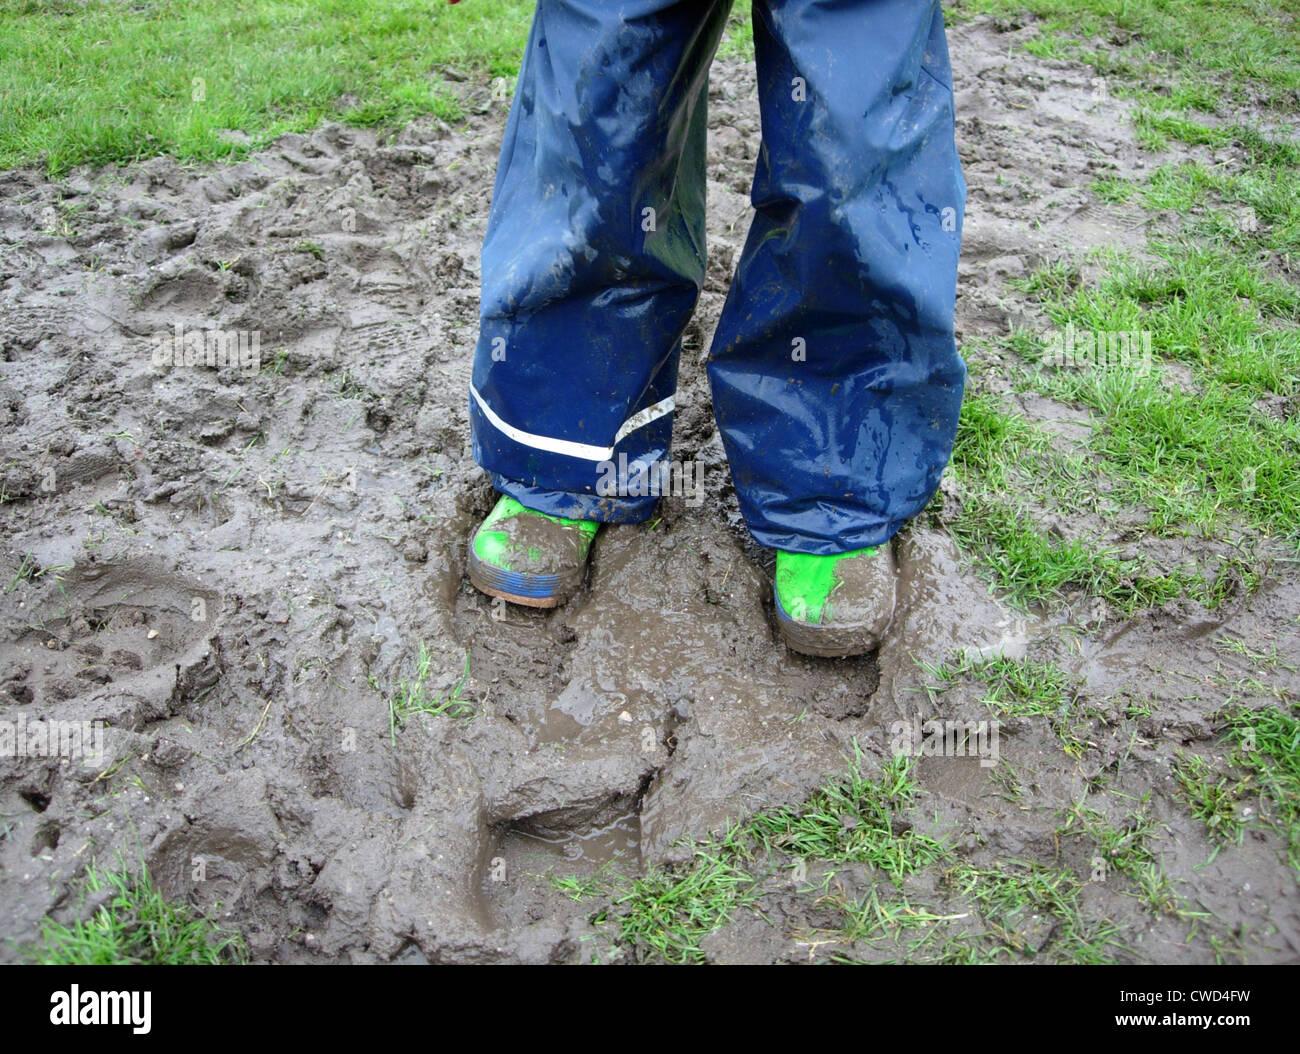 mud,galoshes,rain trousers,rainwear - Stock Image